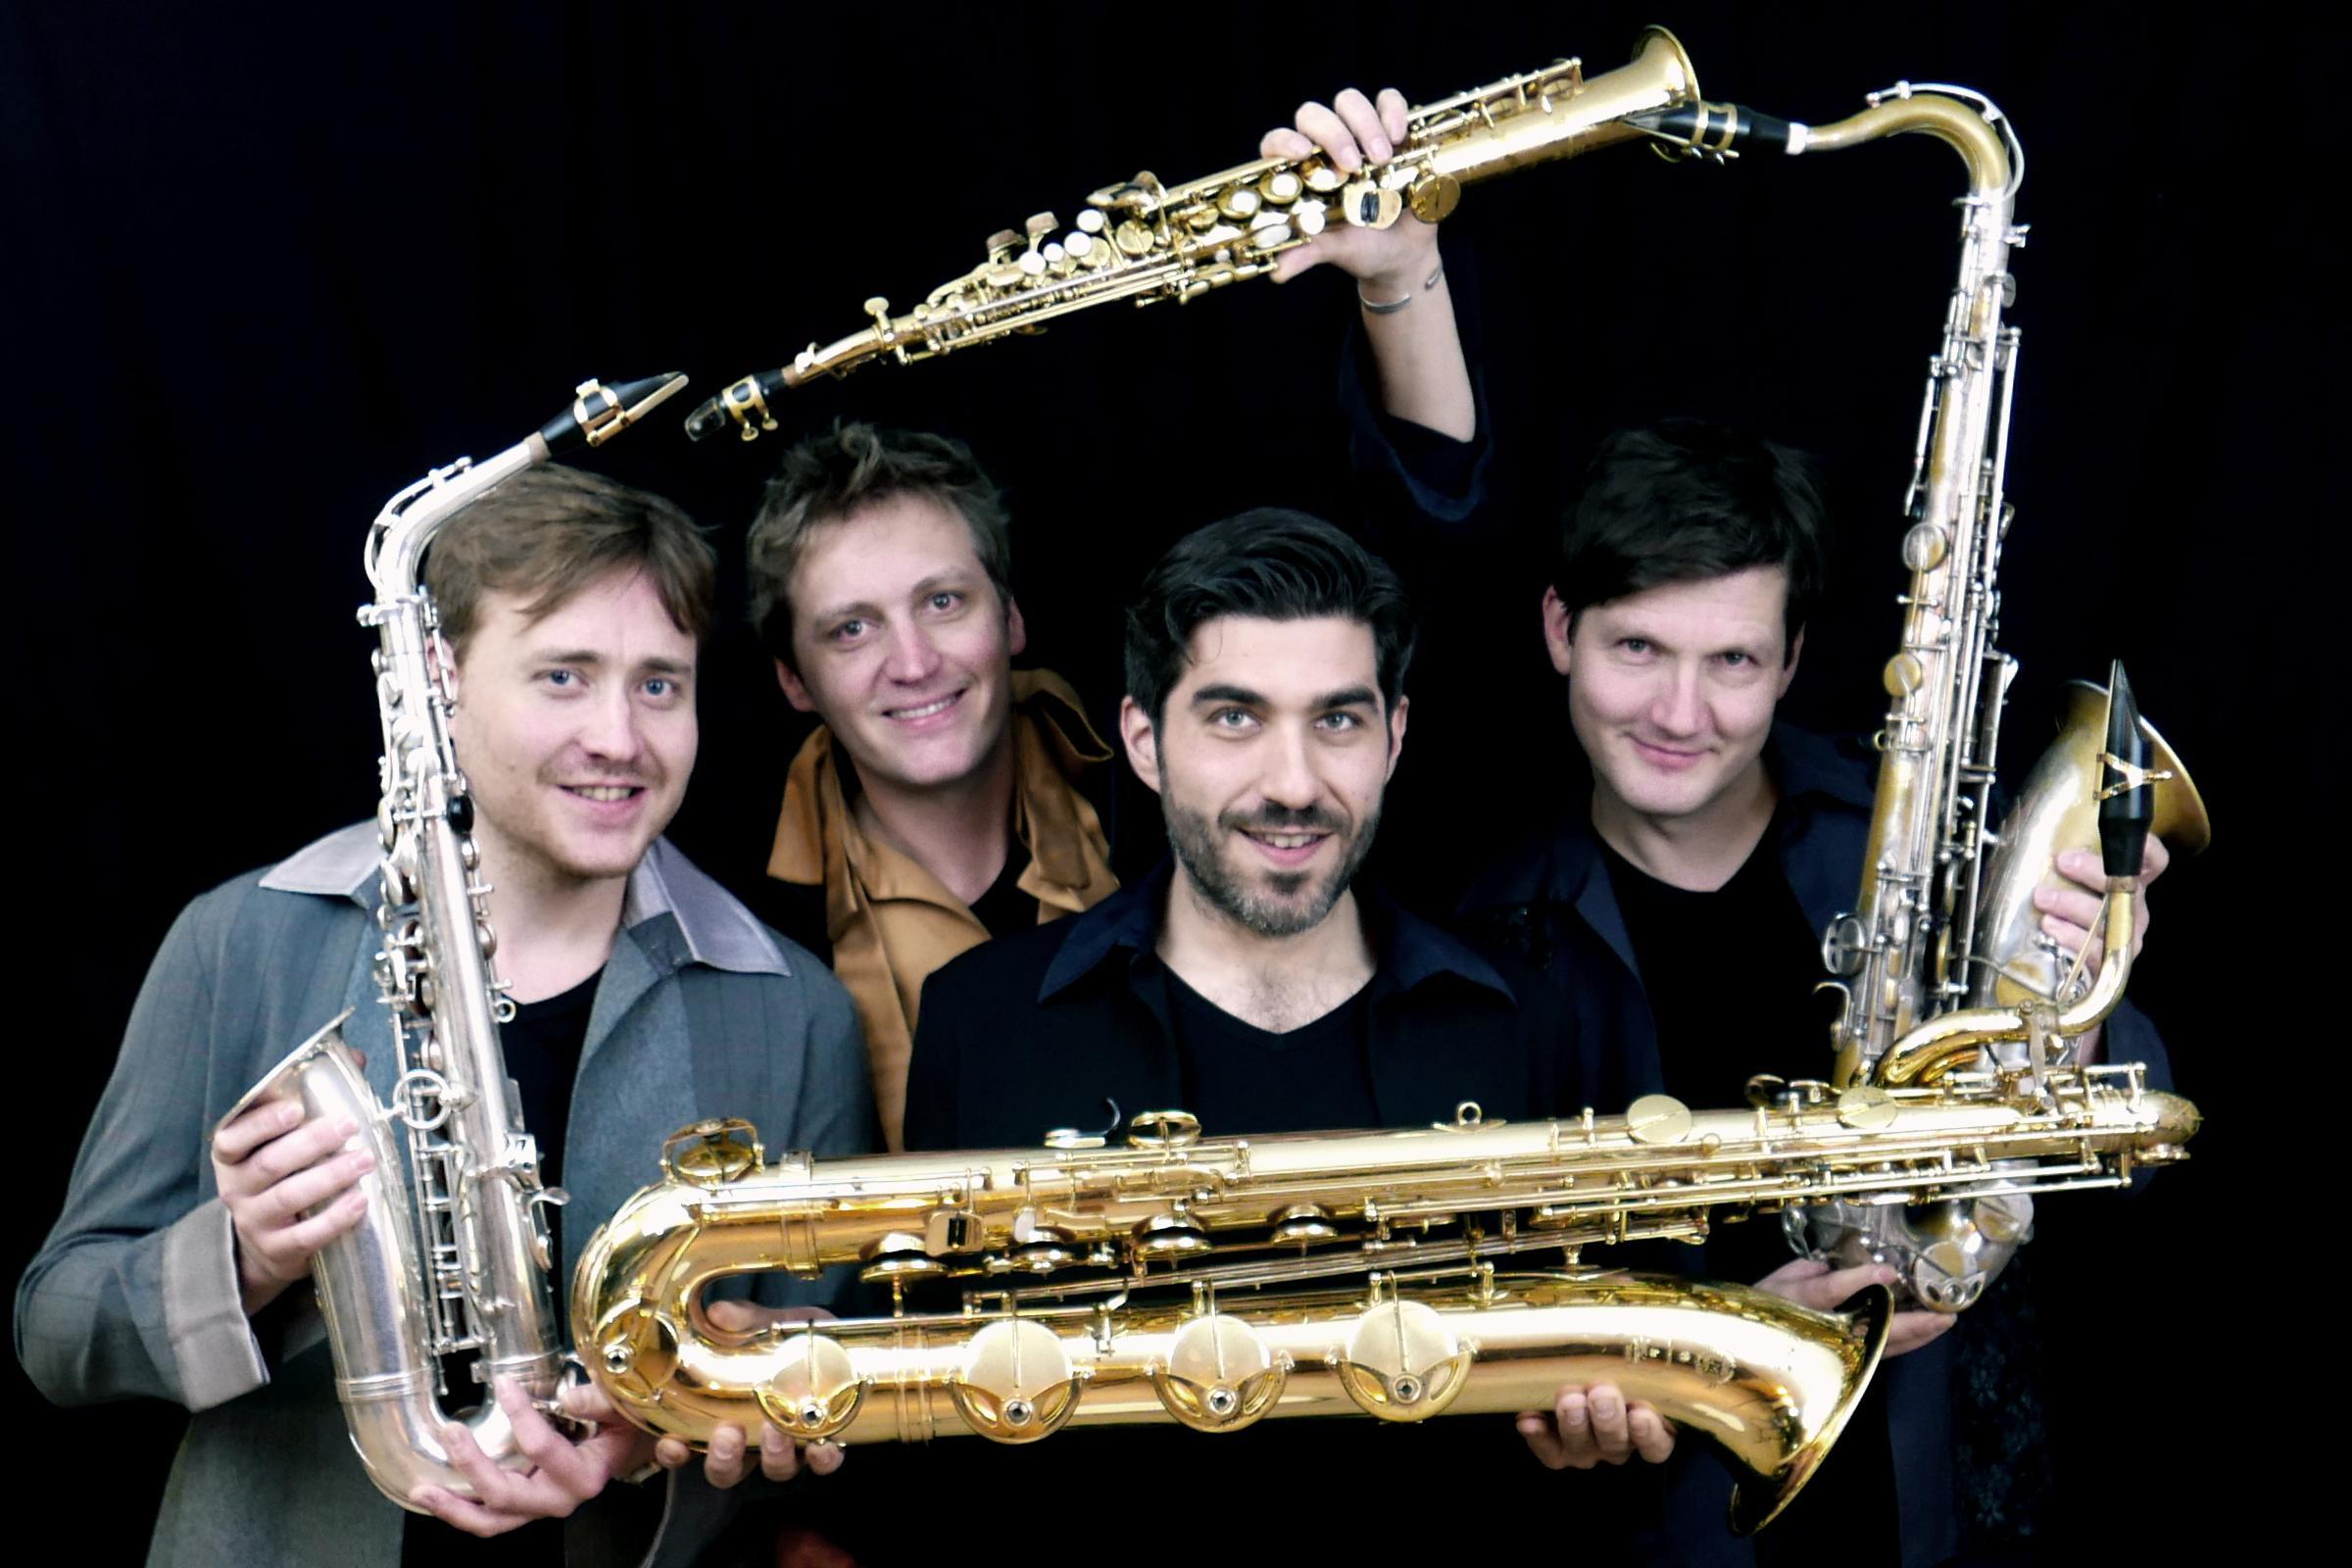 Saxofoon als orgel